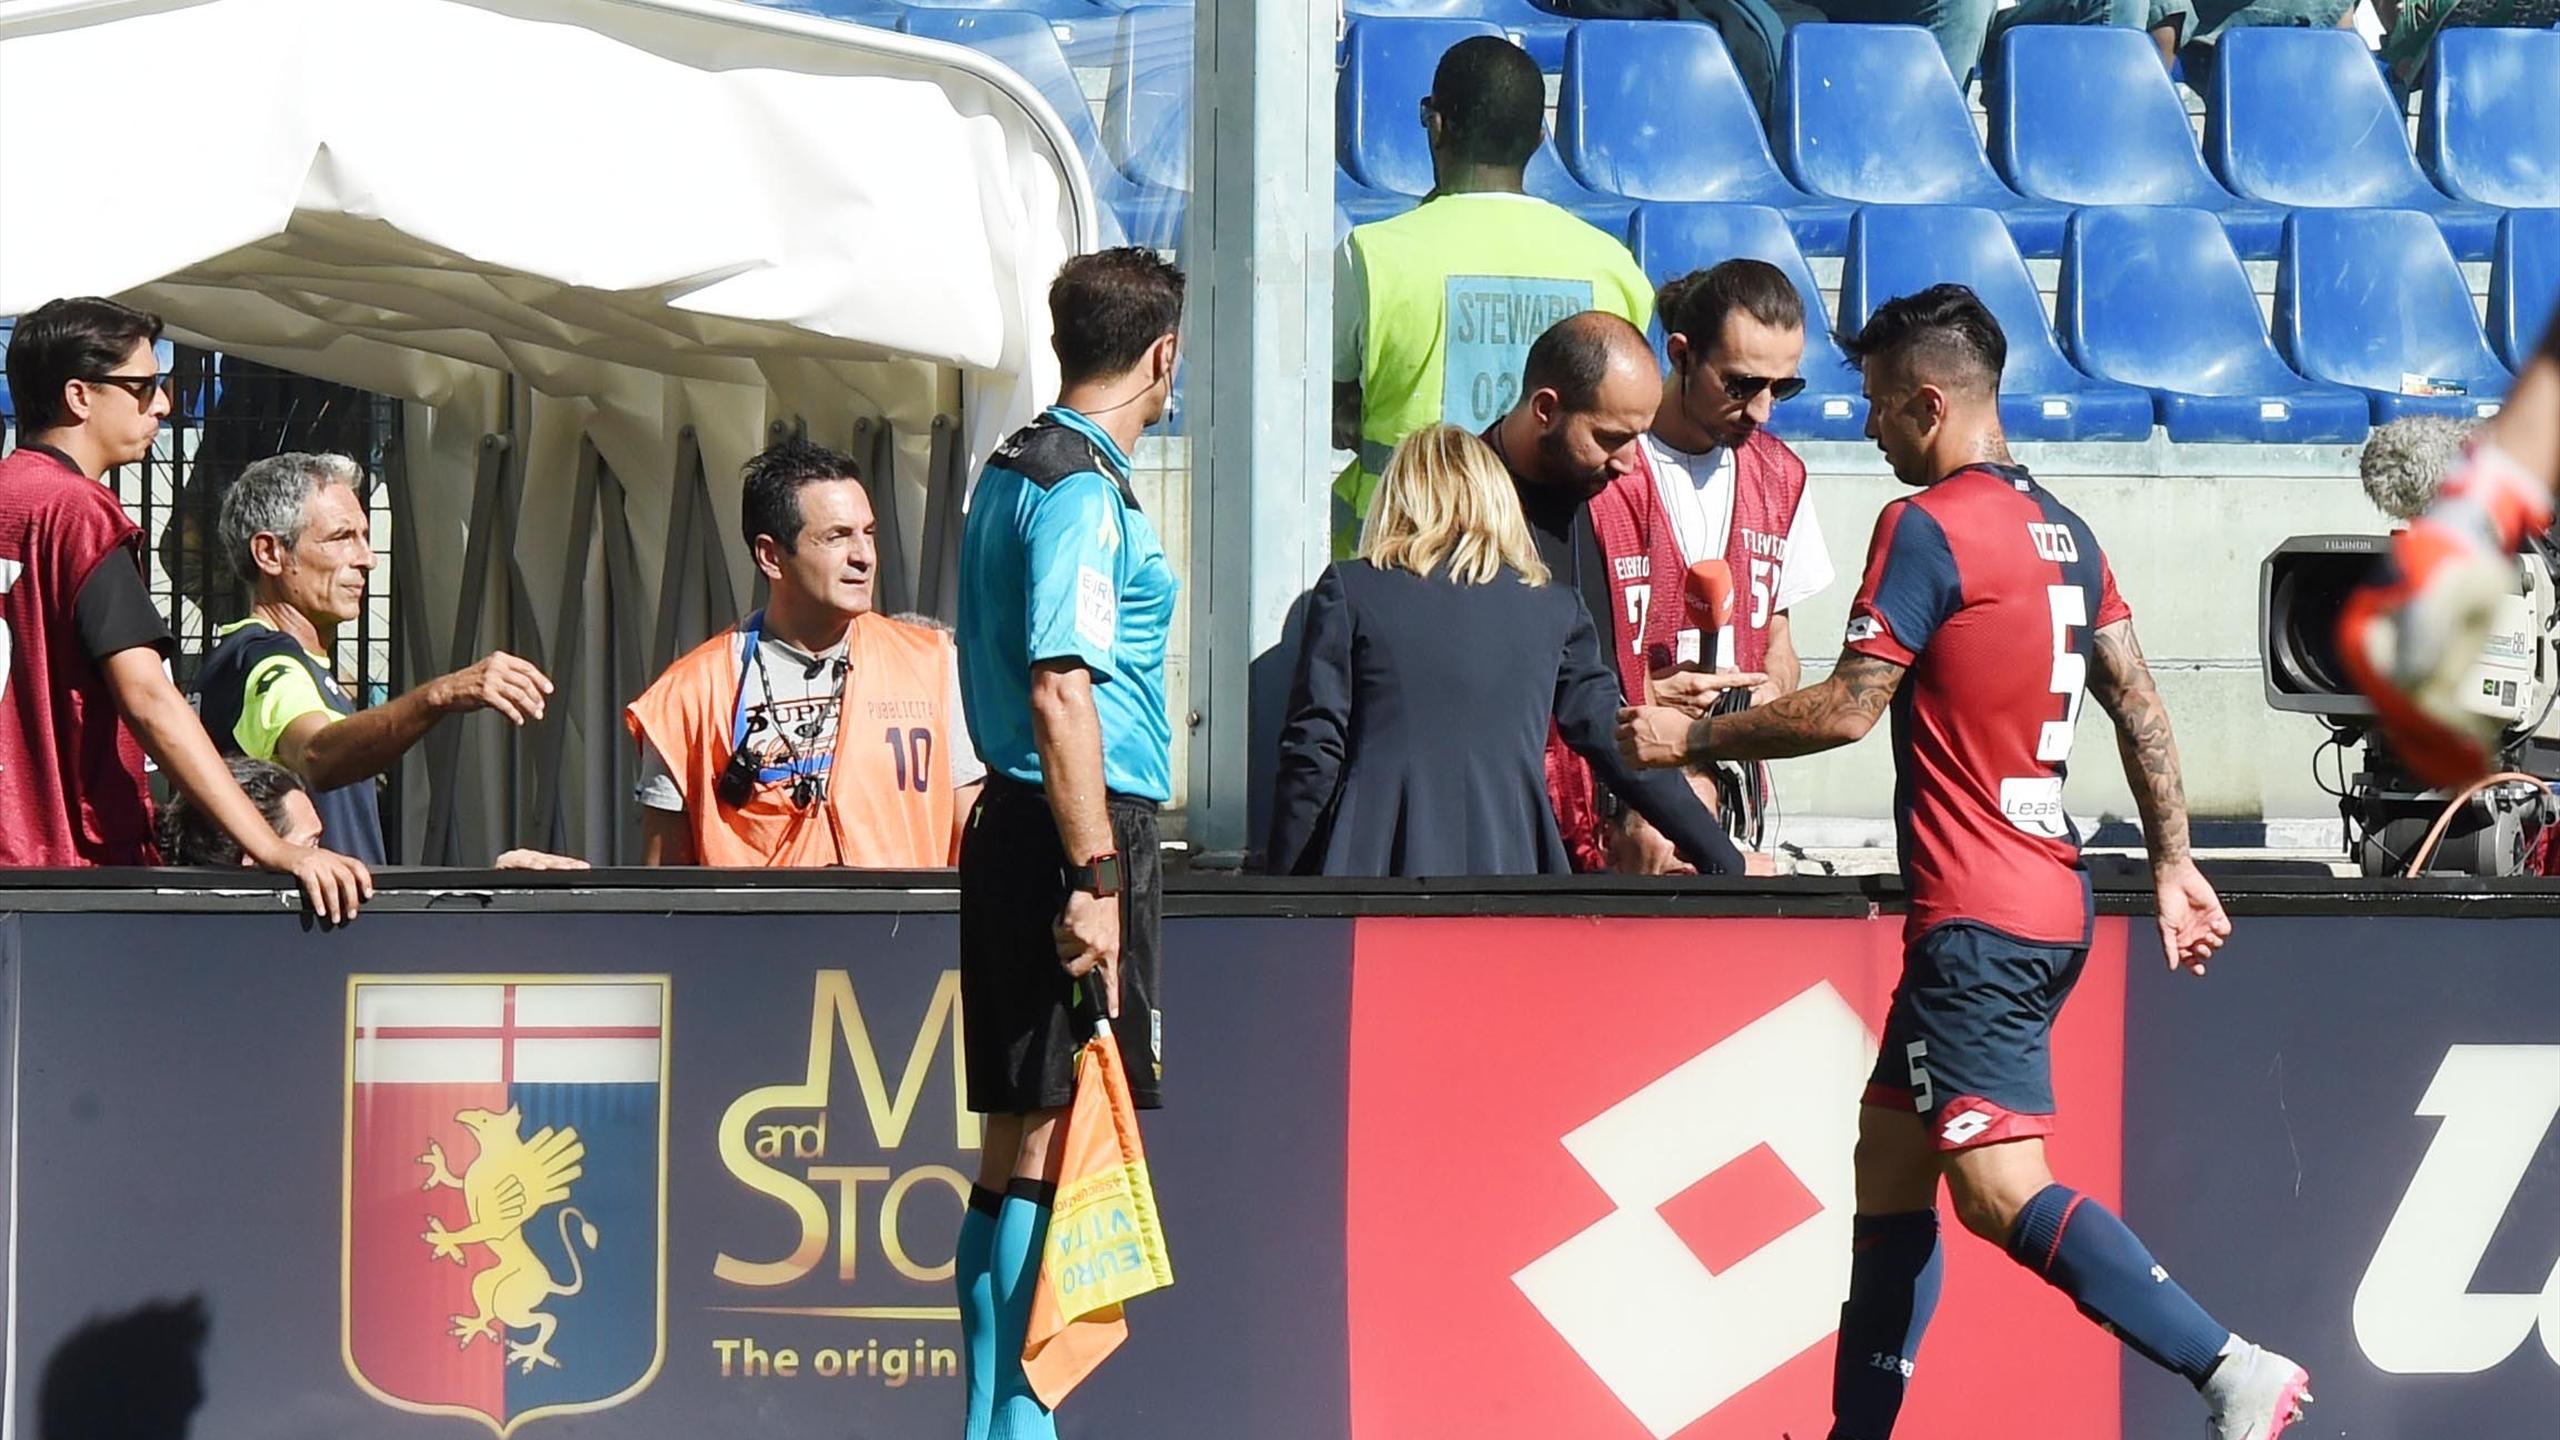 Le pagelle di Genoa-Juventus 0-2 - Serie A 2015-2016 ...